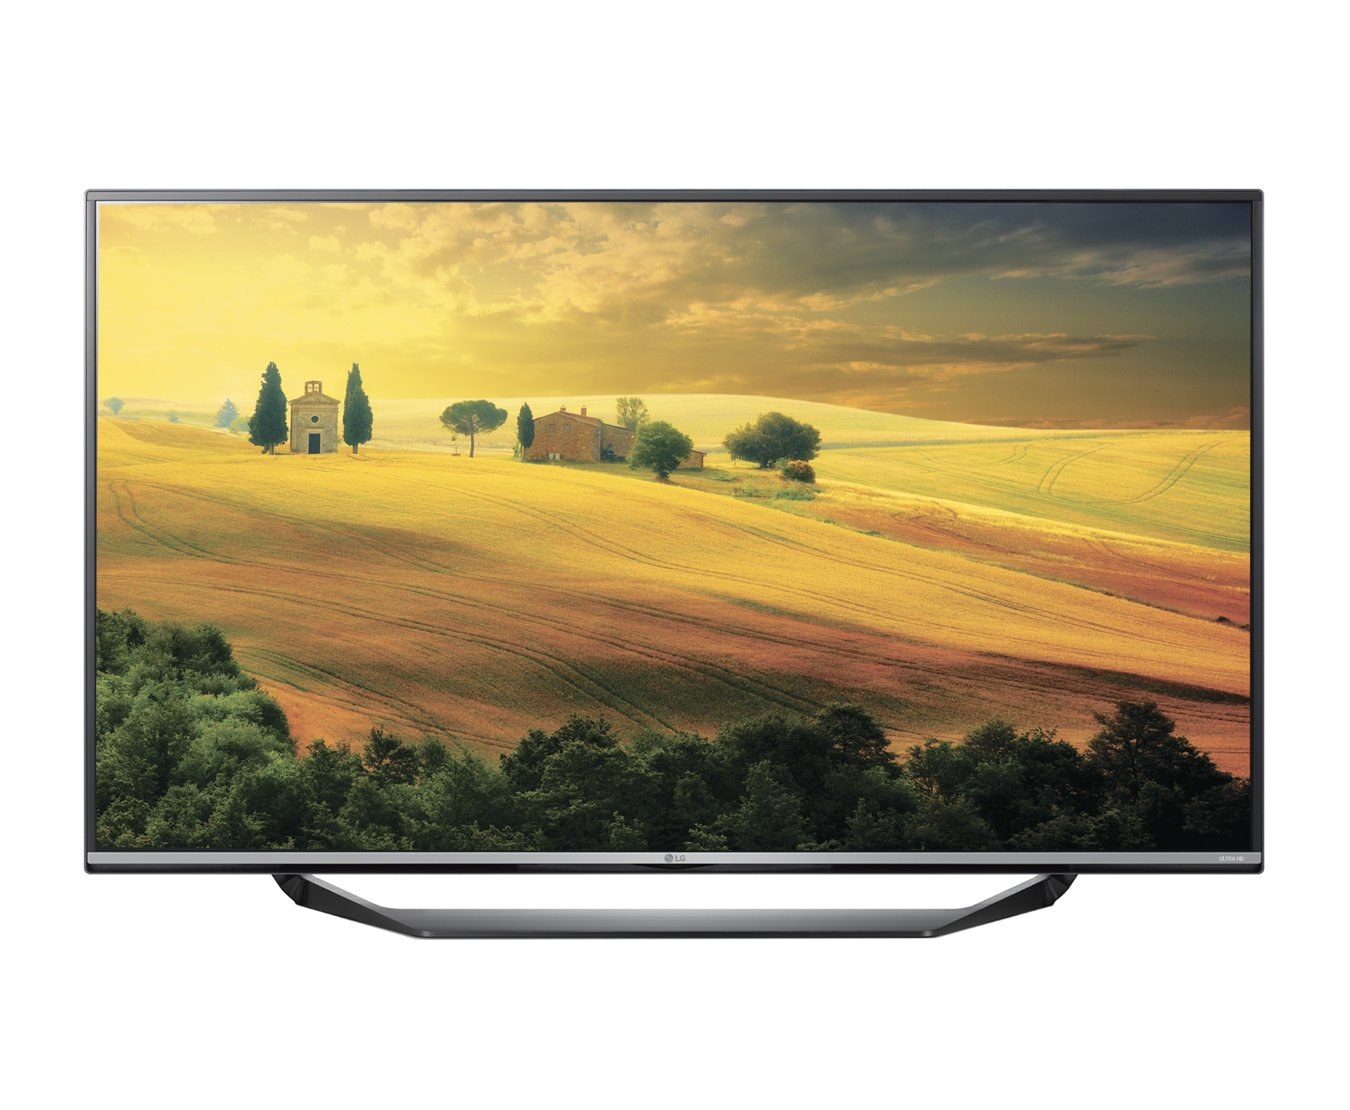 Lg телевизоры все модели цены фото